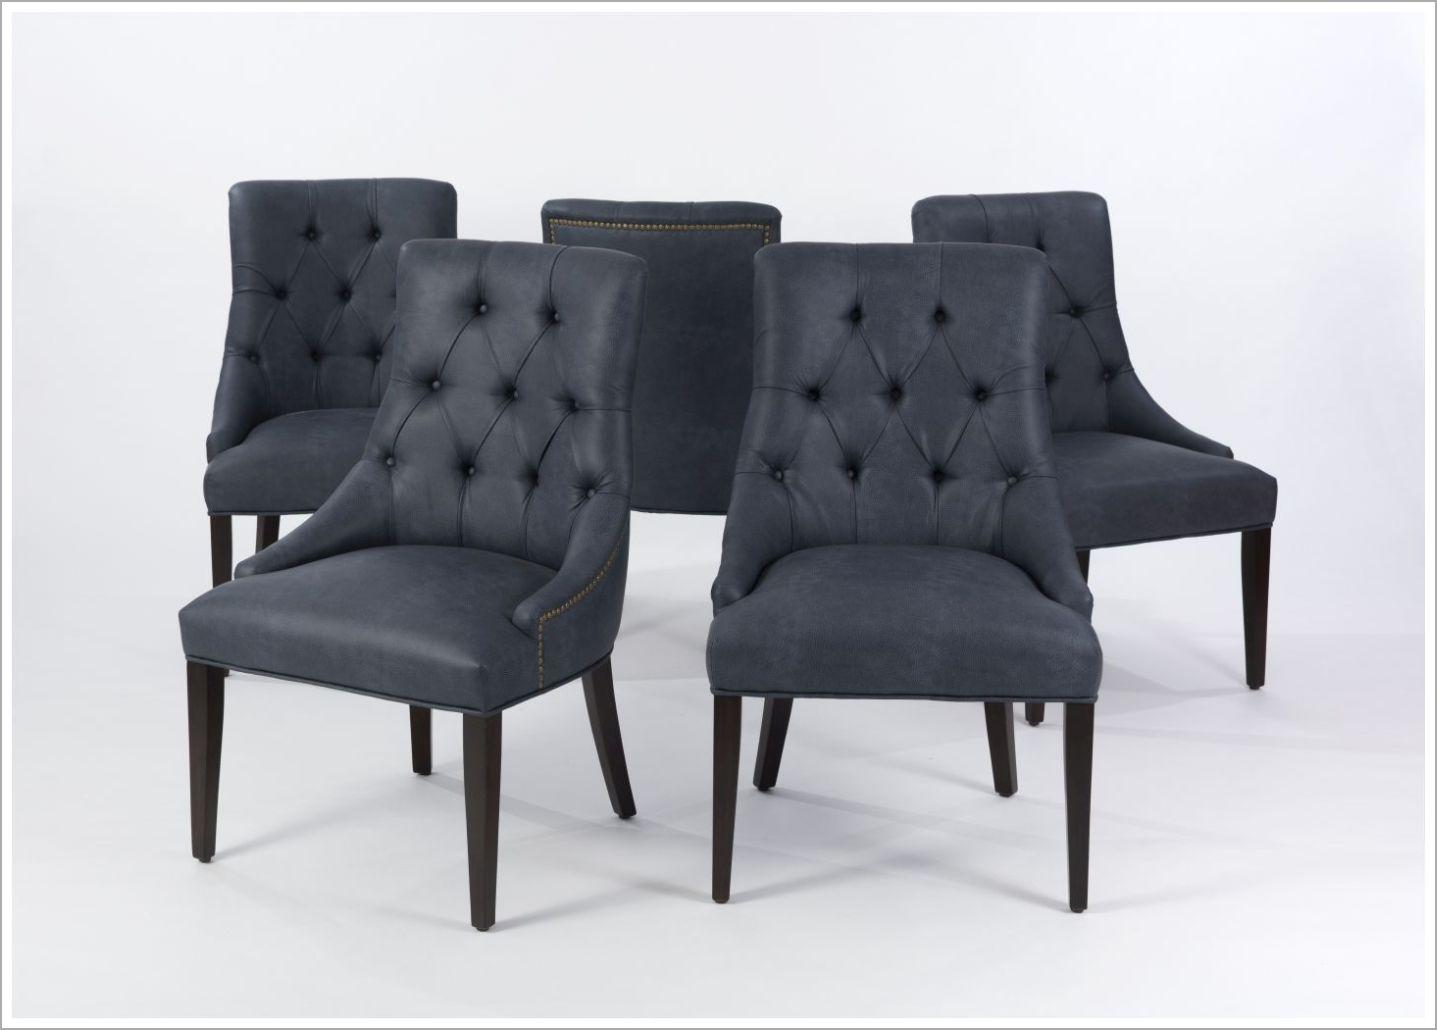 Custom Restaurant Chair with Tufted Back